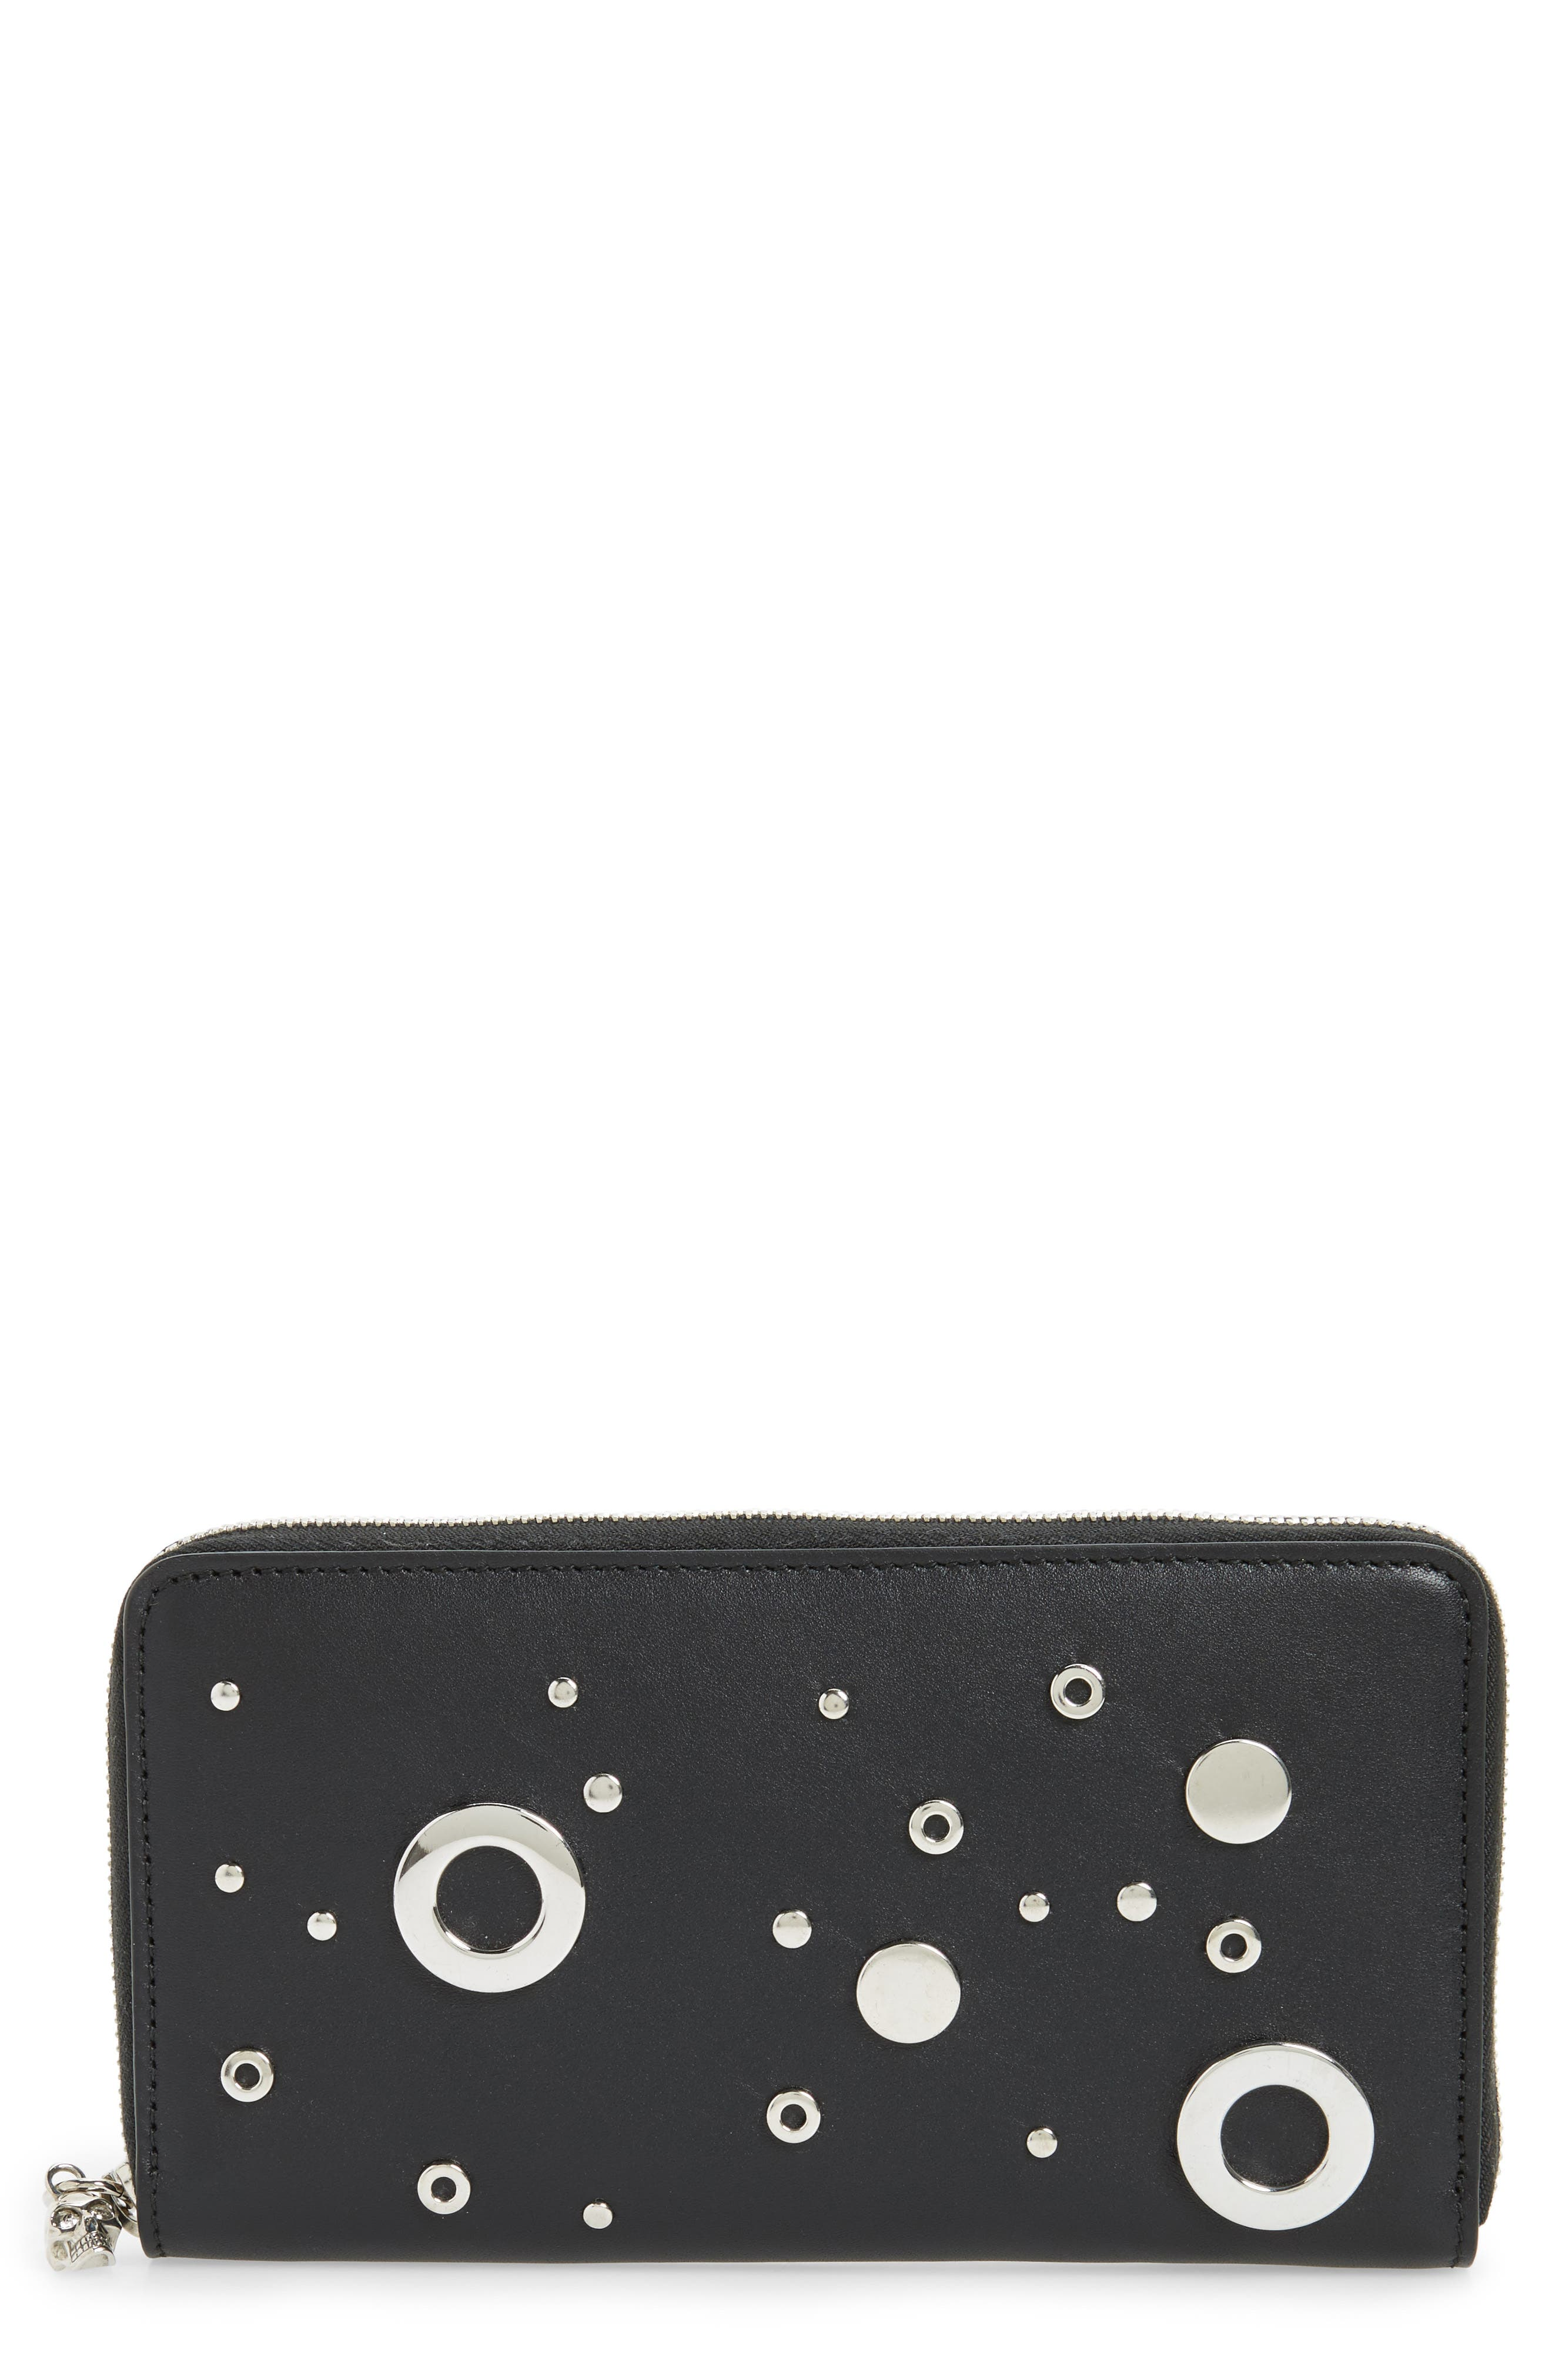 Alternate Image 1 Selected - Alexander McQueen Grommet & Stud Calfskin Leather Continental Wallet